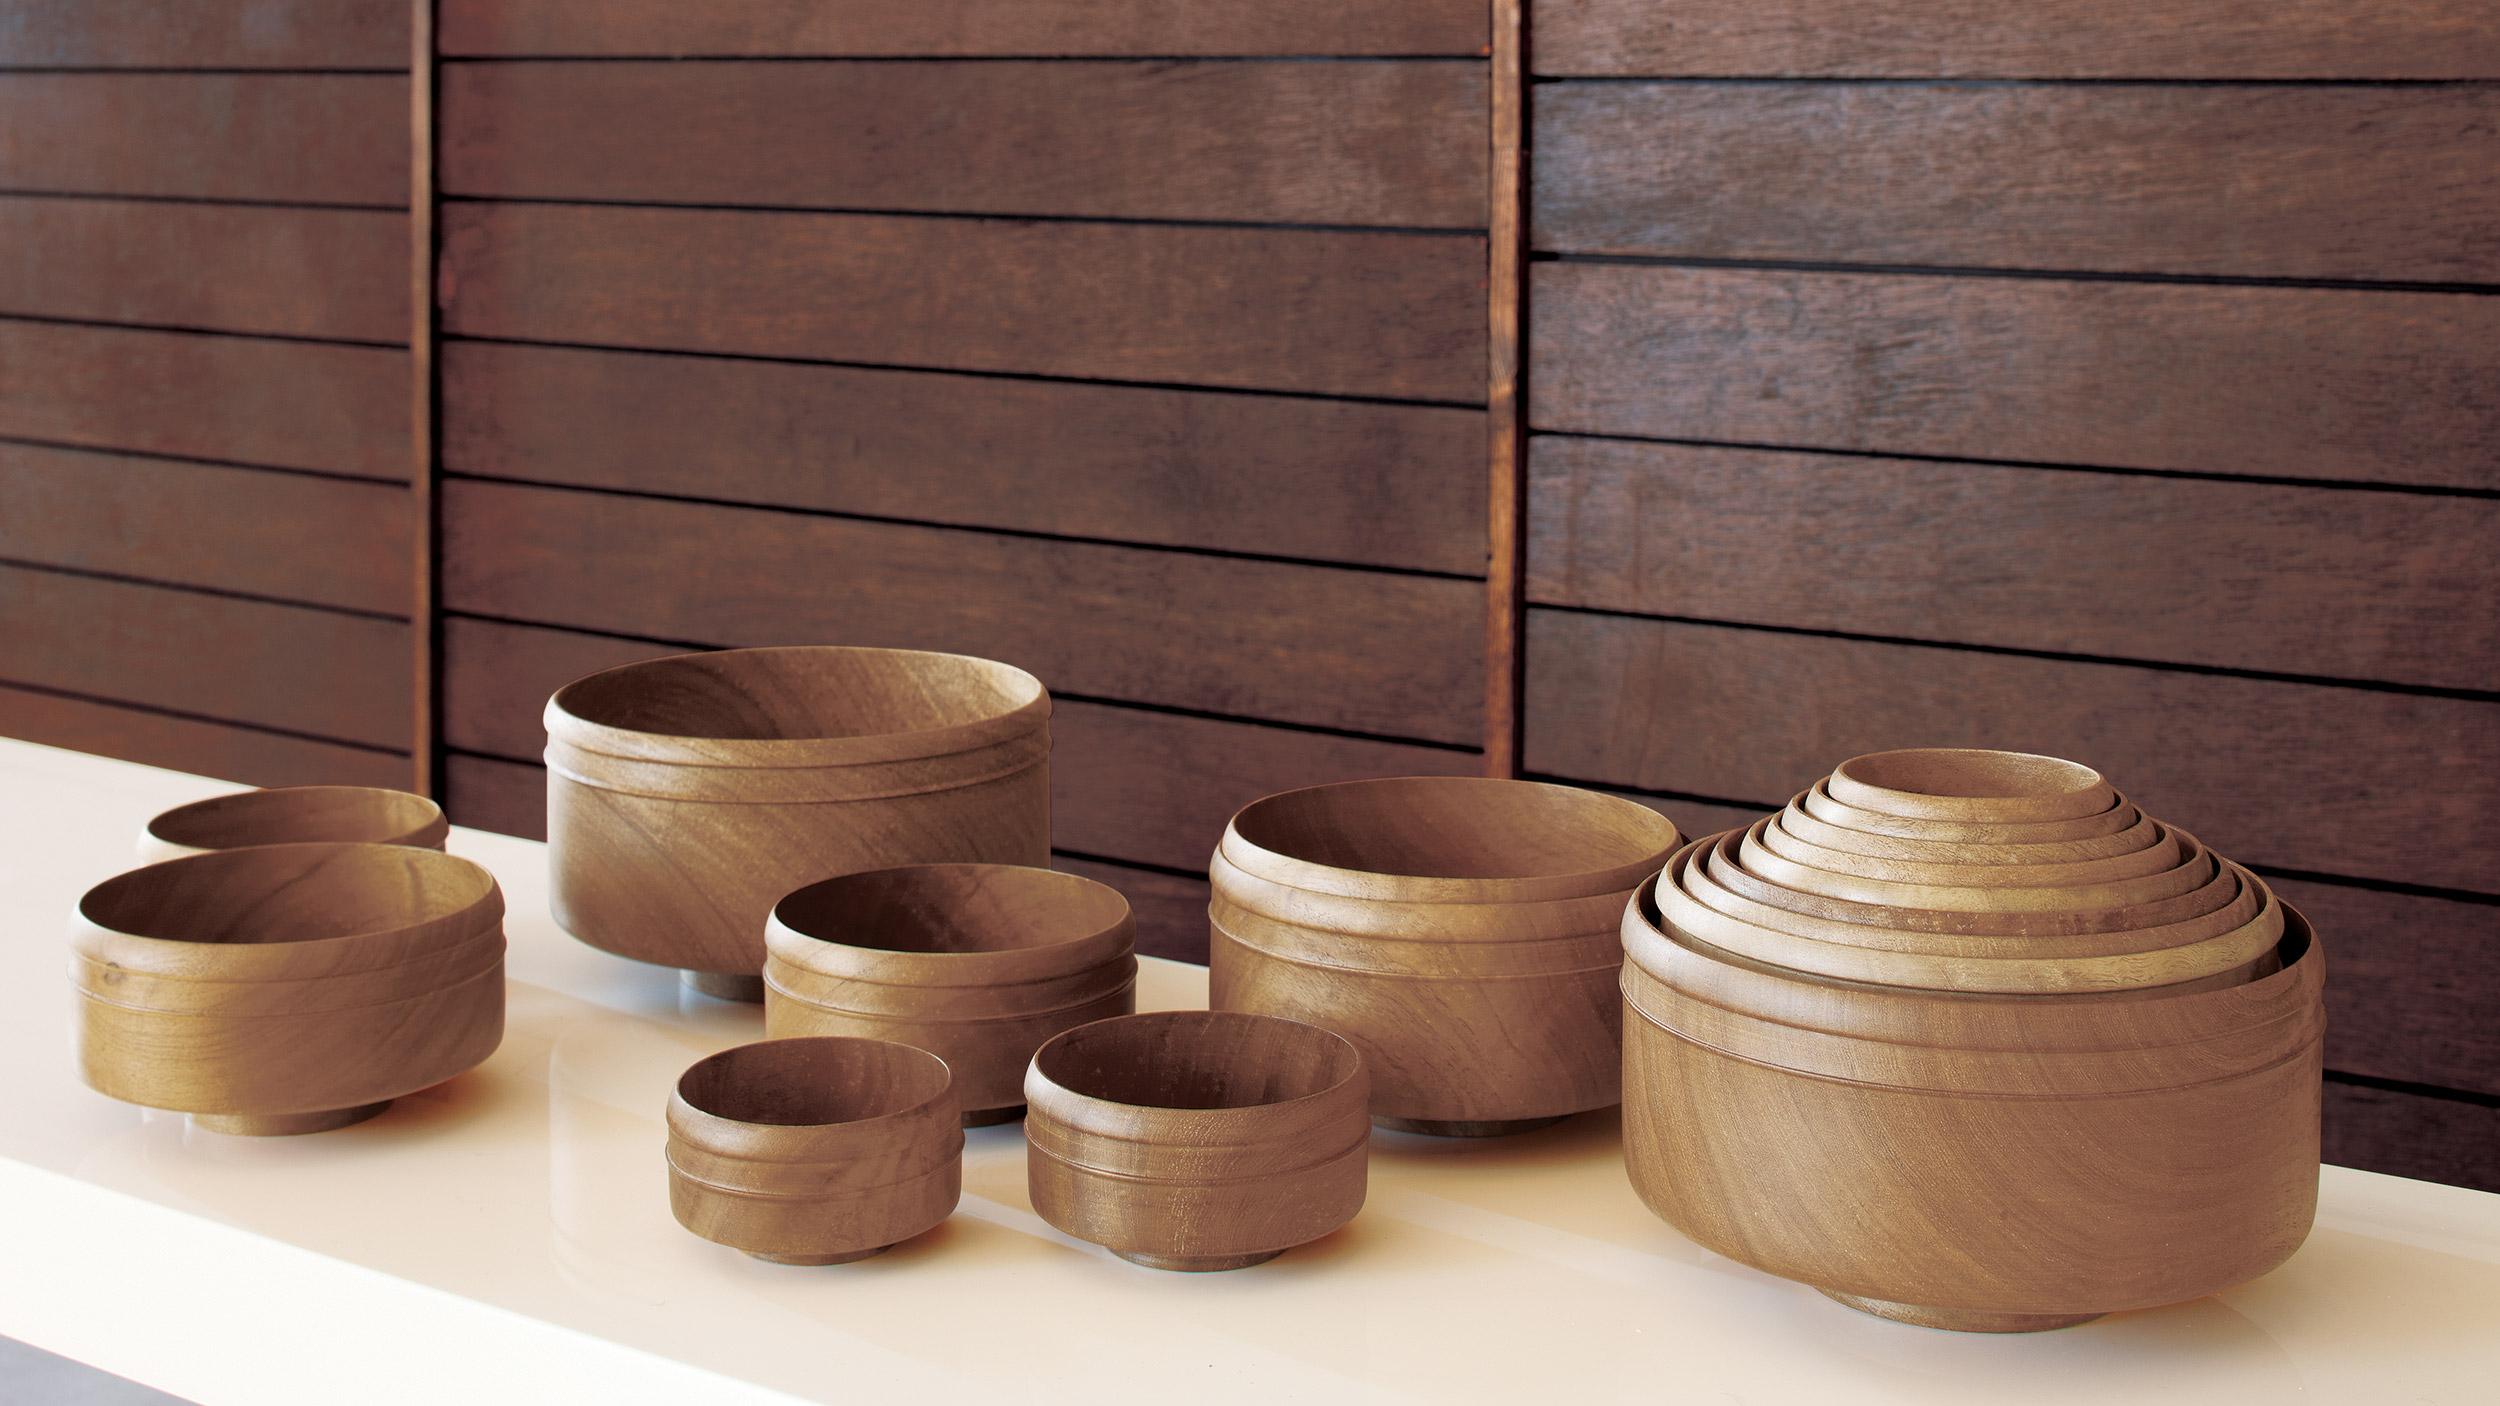 CB2_jain-monk-bowls_molly-fitzsimons.jpg